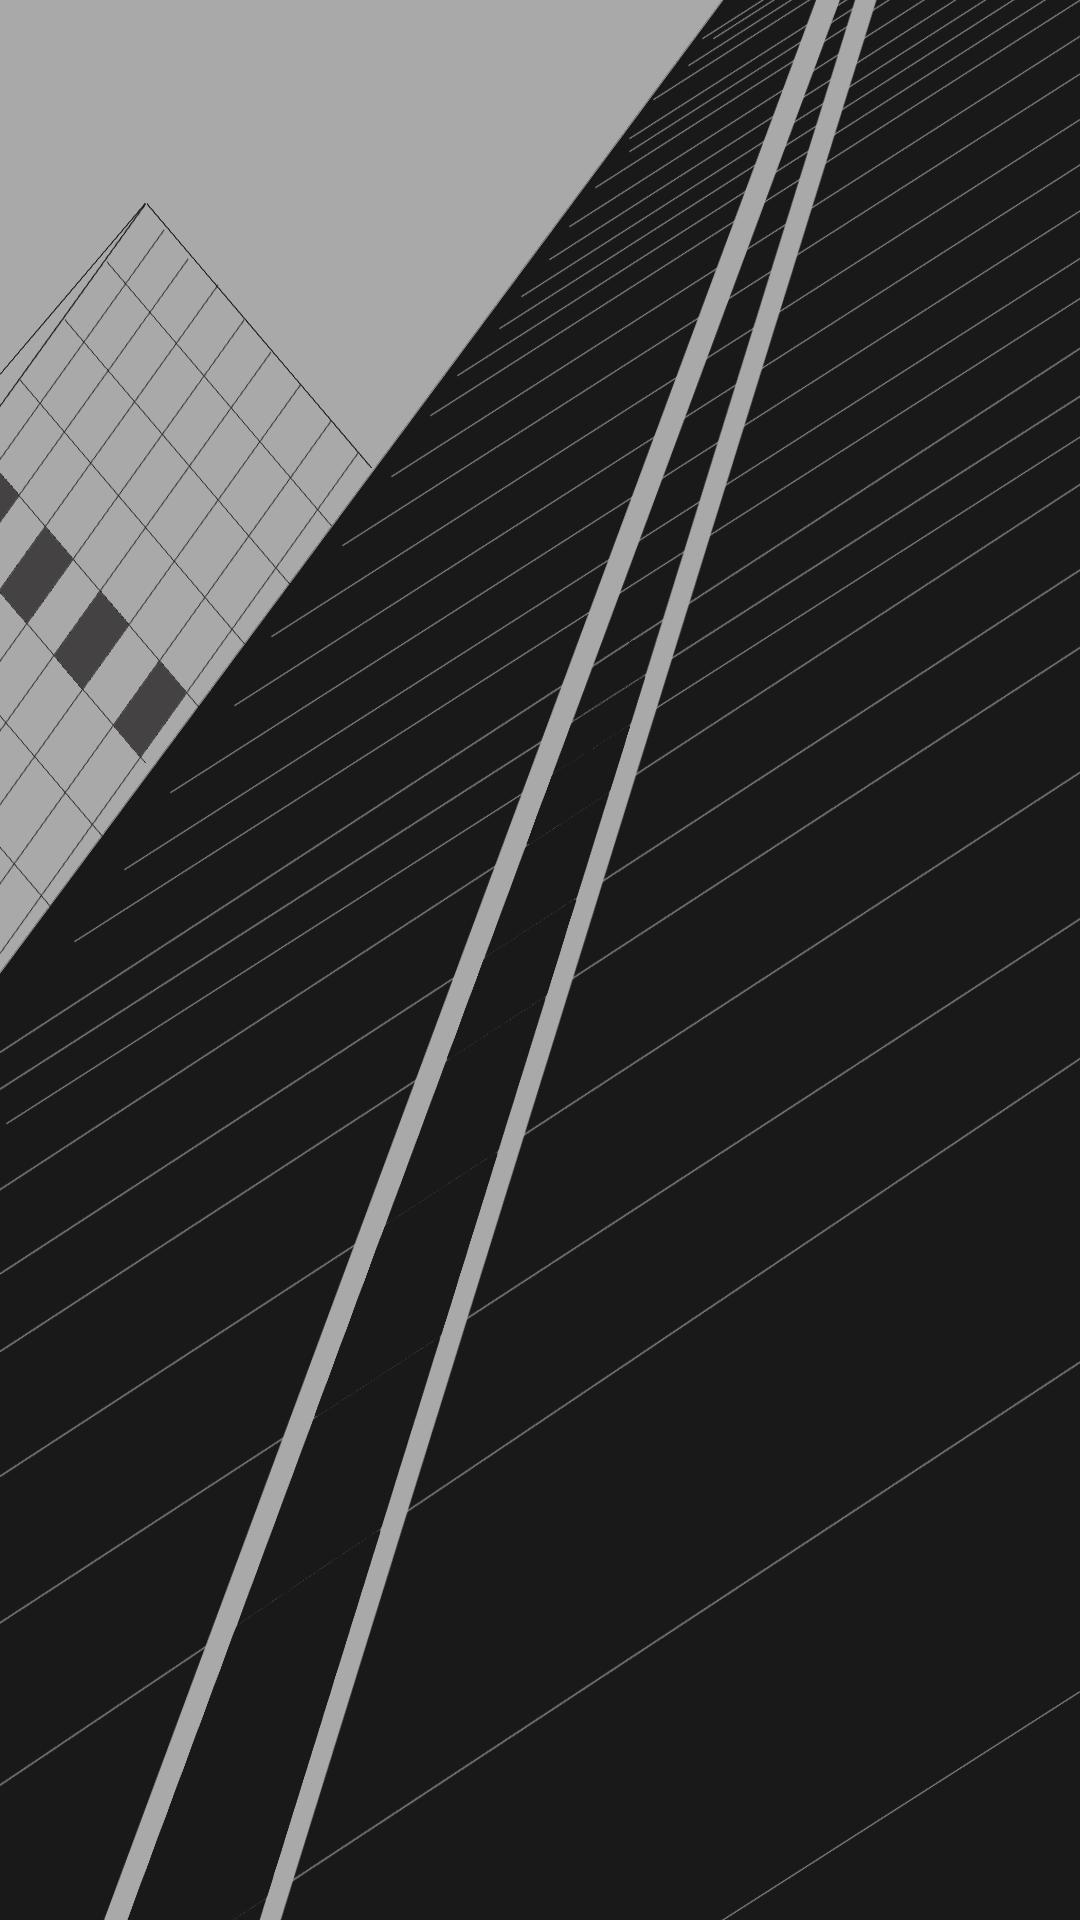 iPhone 7 geometric wallpaper 1080x1920